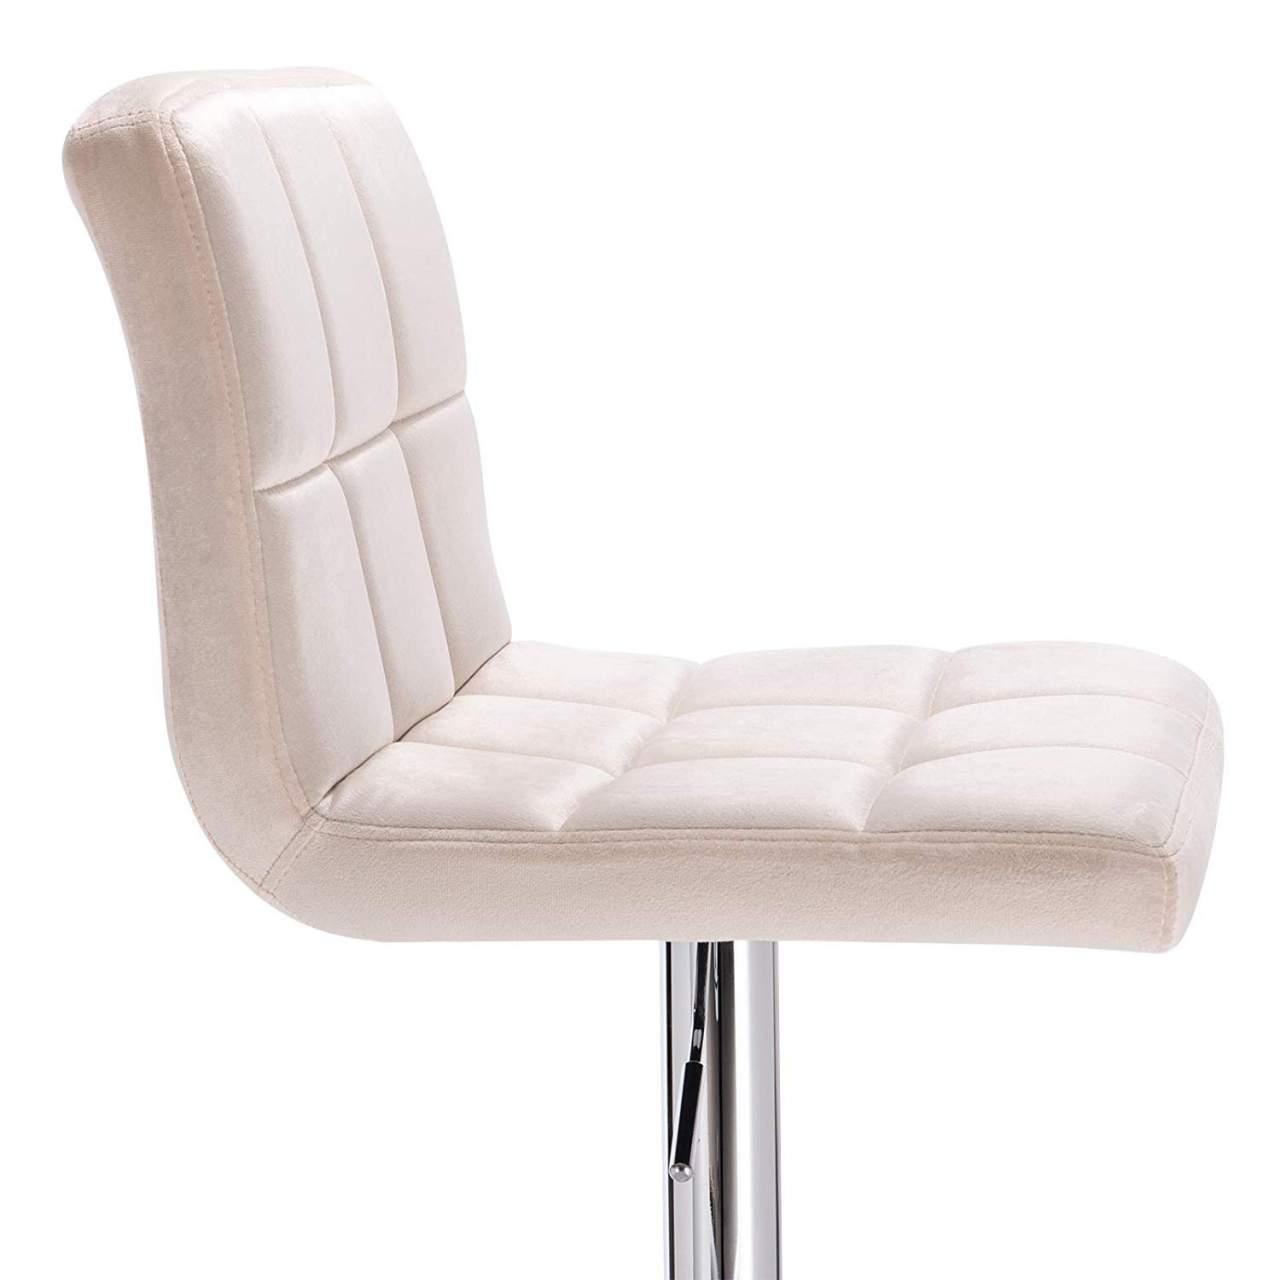 Hocker Stuhl Mit Lehne